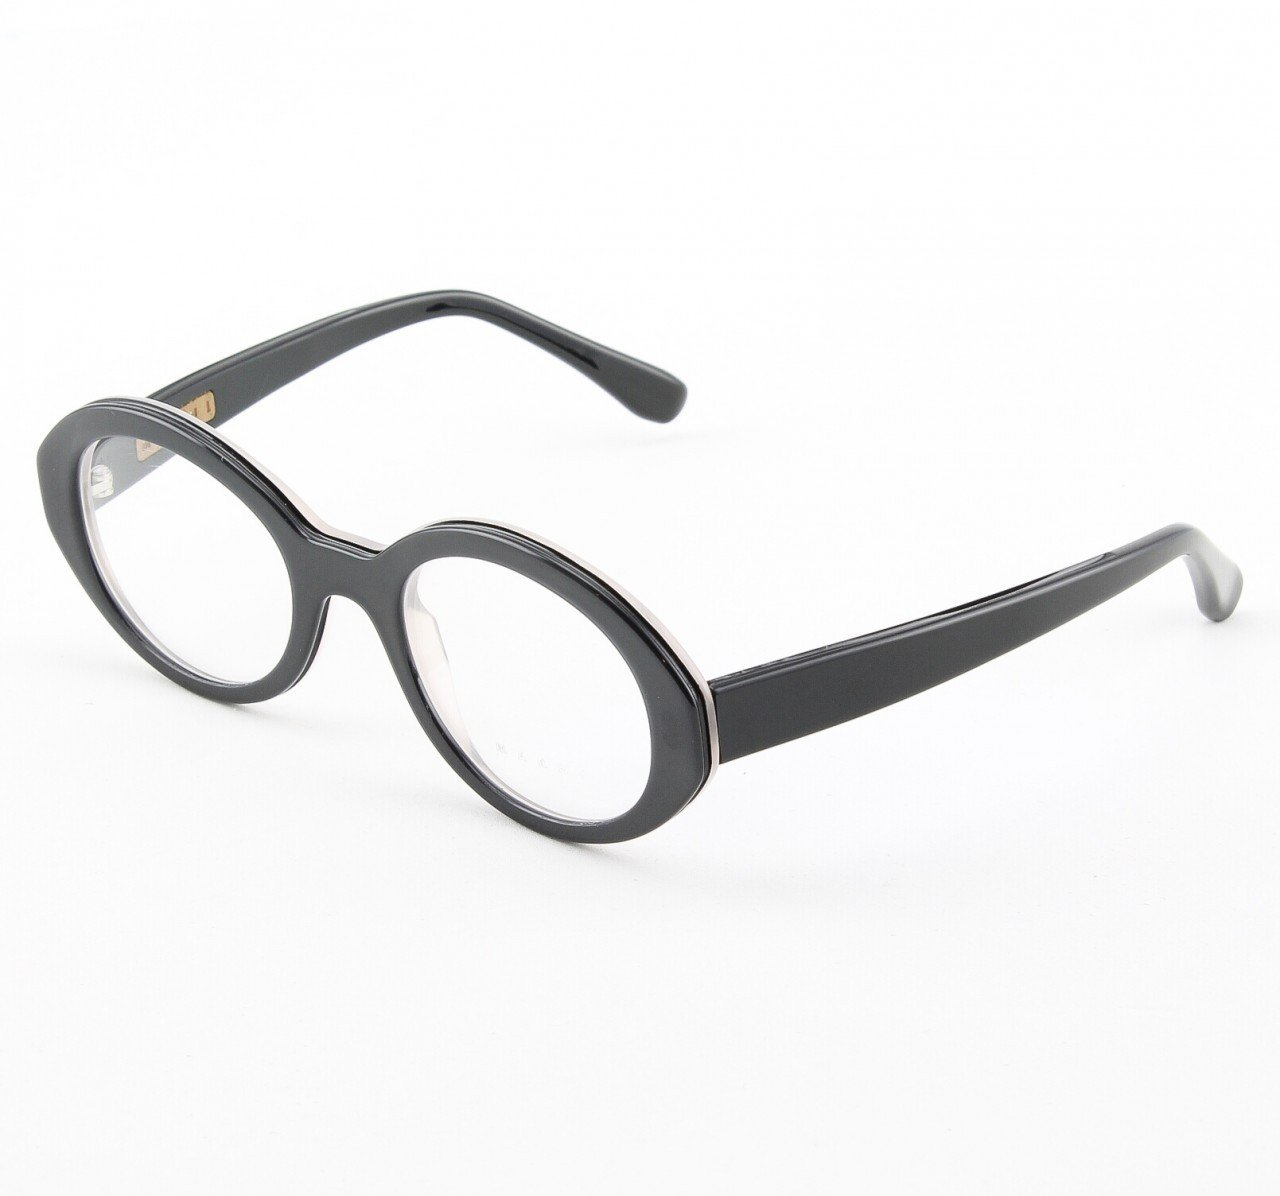 Marni MA651S Eyeglasses Col. 17 High Gloss Black Frame with Clear Lenses